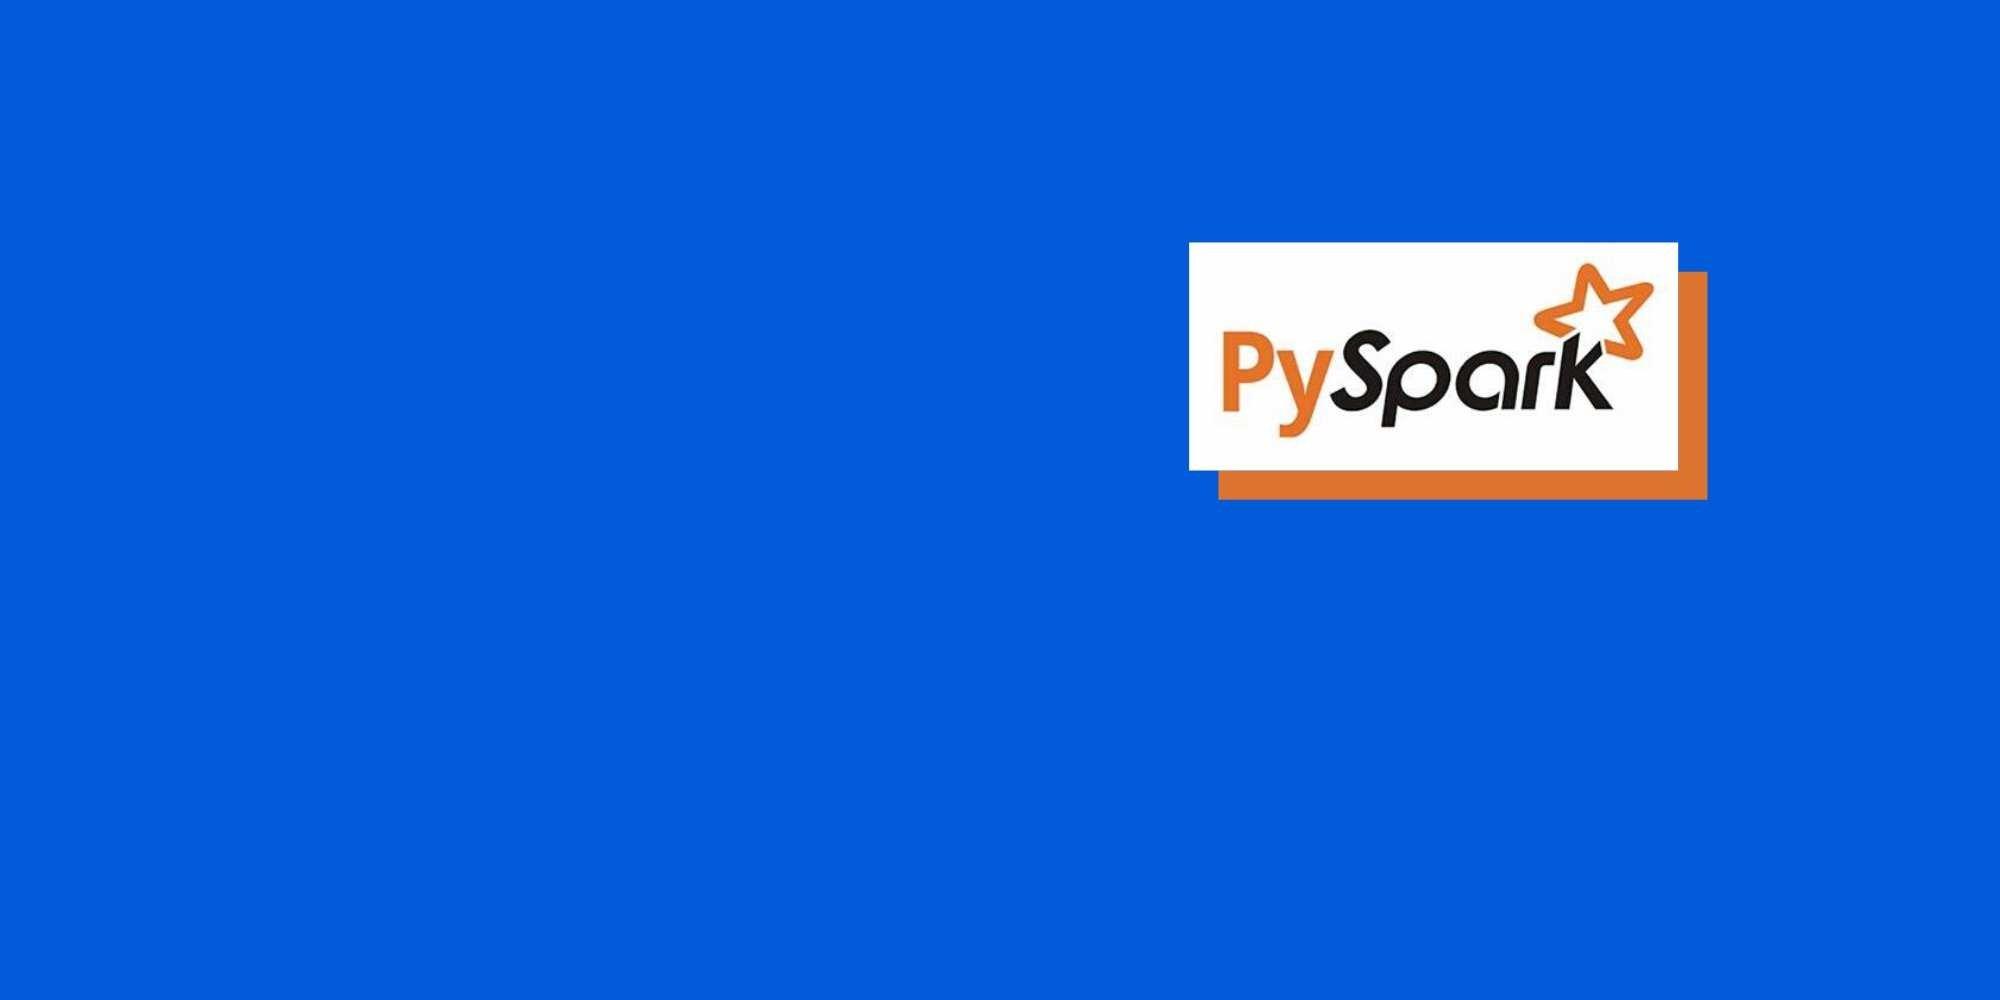 pyspark (1)